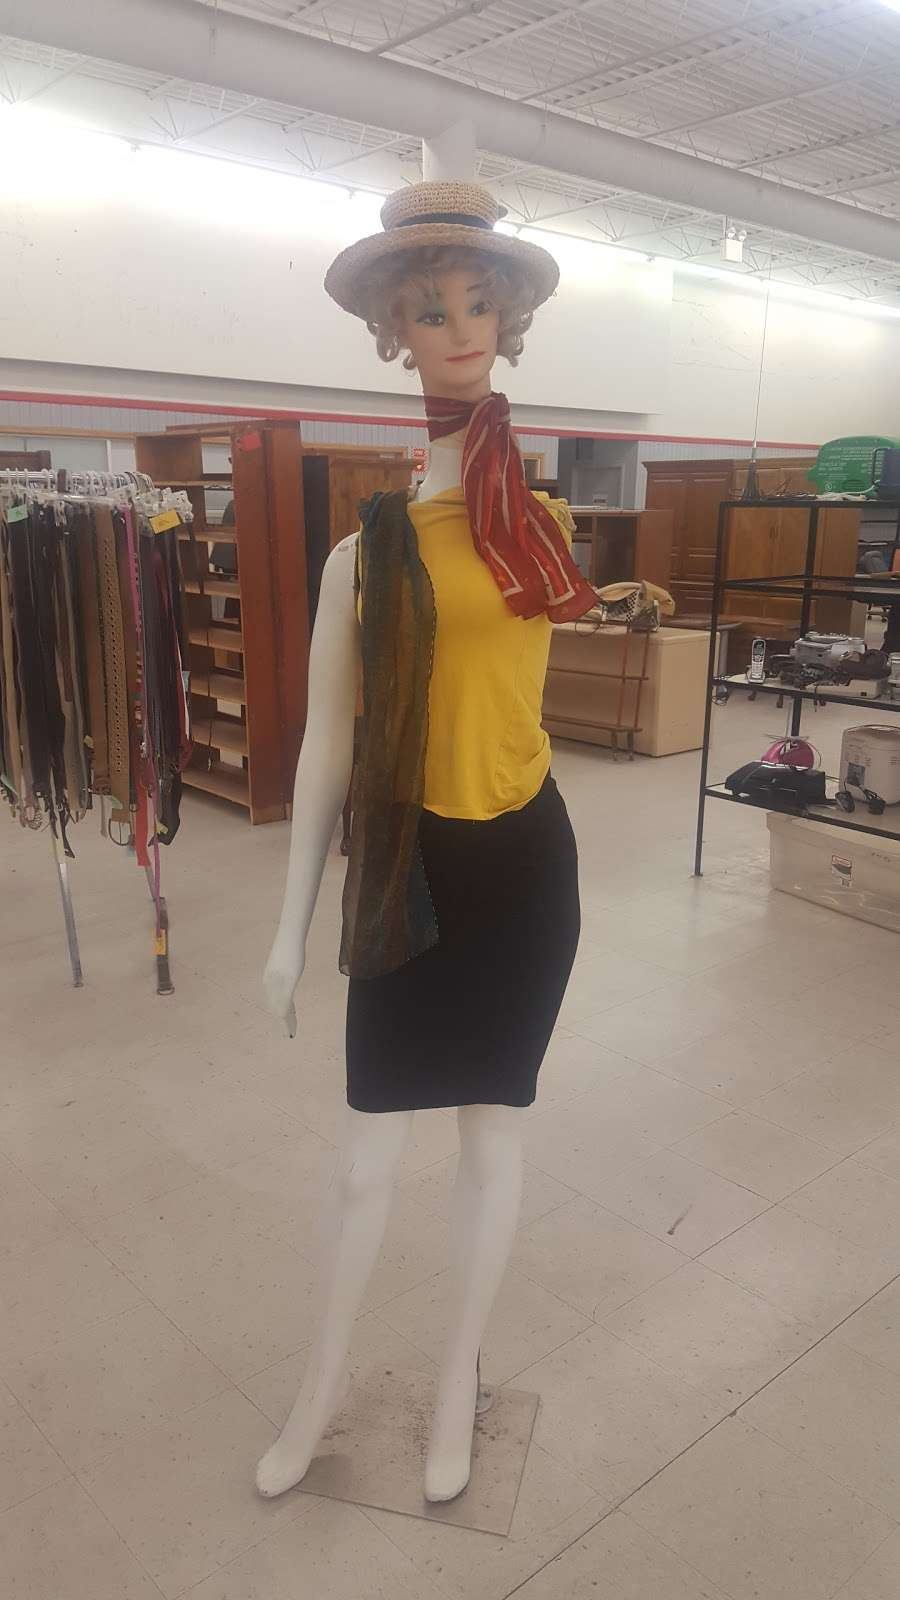 Family Thrift Store - store  | Photo 3 of 4 | Address: 9527 Blue Ridge Blvd, Kansas City, MO 64134, USA | Phone: (816) 763-6688